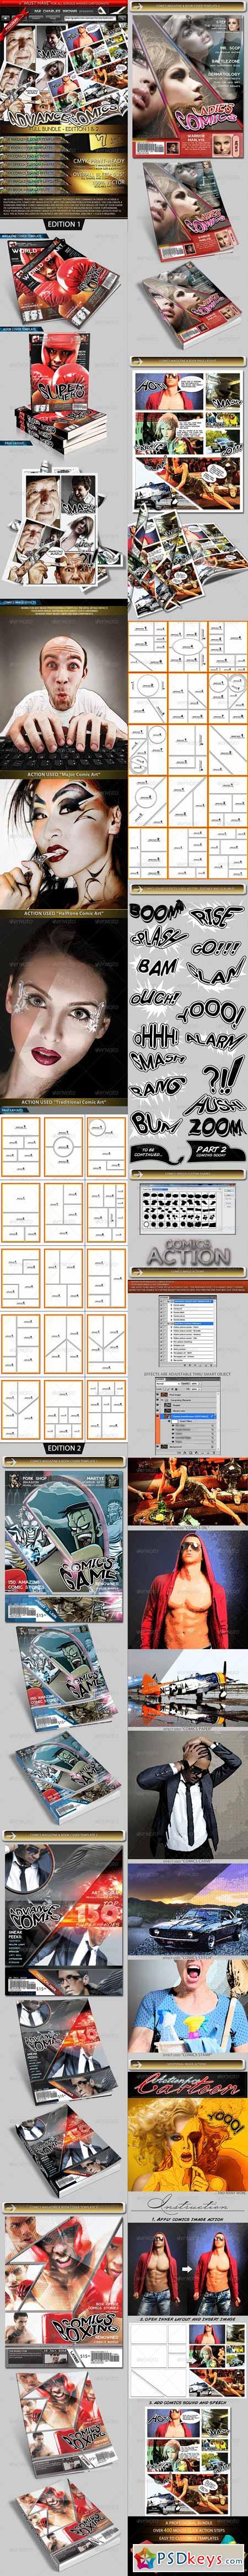 Advance Comics Publication Kit - Full Bundle 2524448